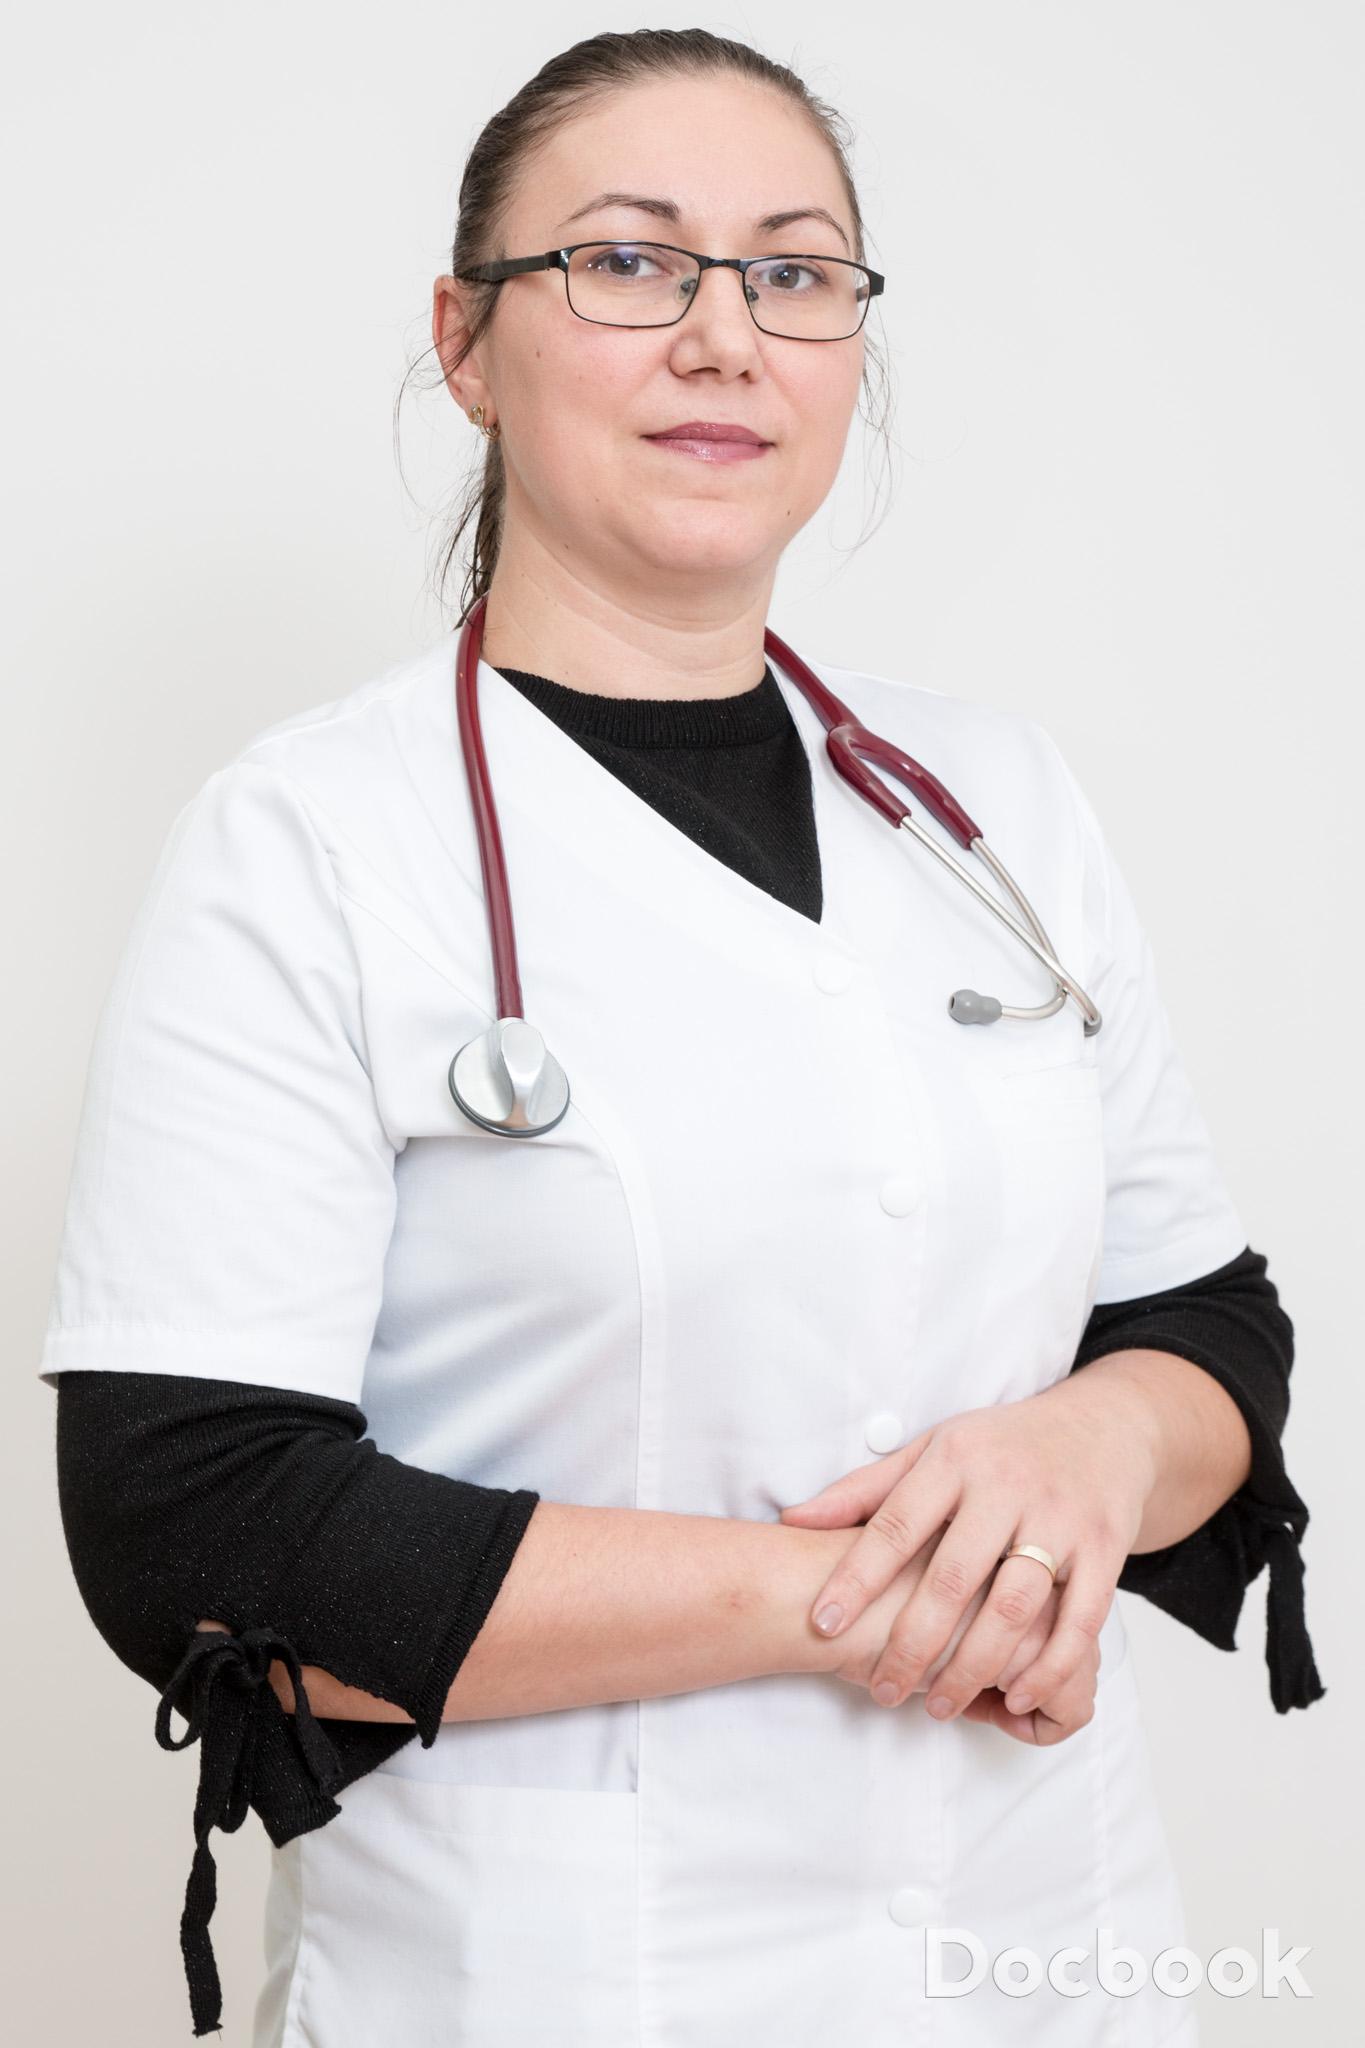 Dr. Mihaela Simona Ene Matei